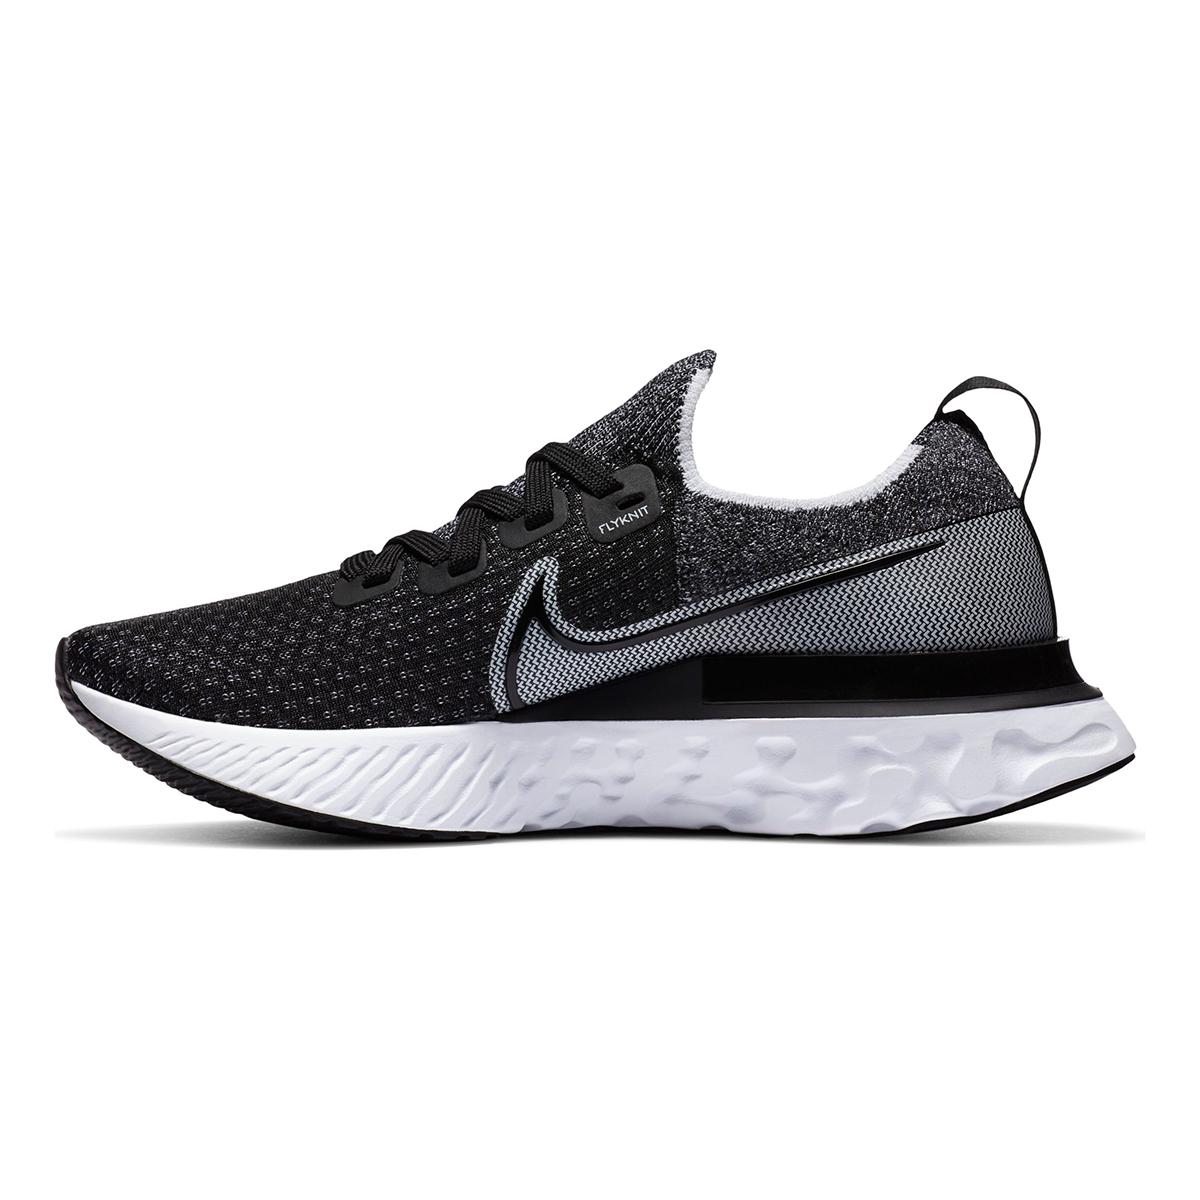 Women's Nike React Infinity Run Flyknit Running Shoe - Color: Black/White/White - Size: 5 - Width: Regular, Black/White/White, large, image 4